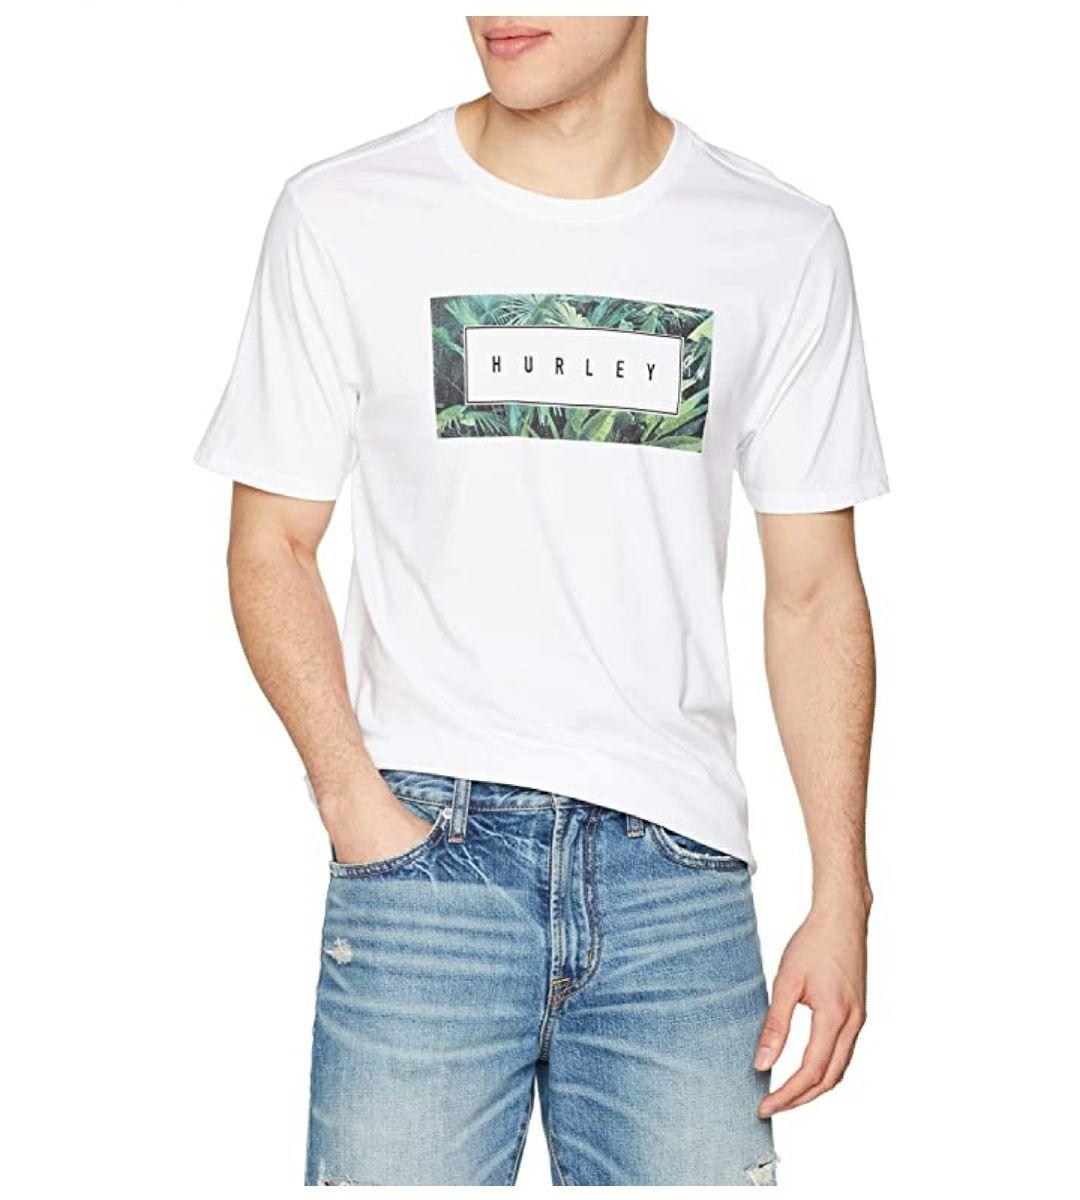 TALLA S - Hurley Time To Grow PRM tee SS - Camisetas Hombre